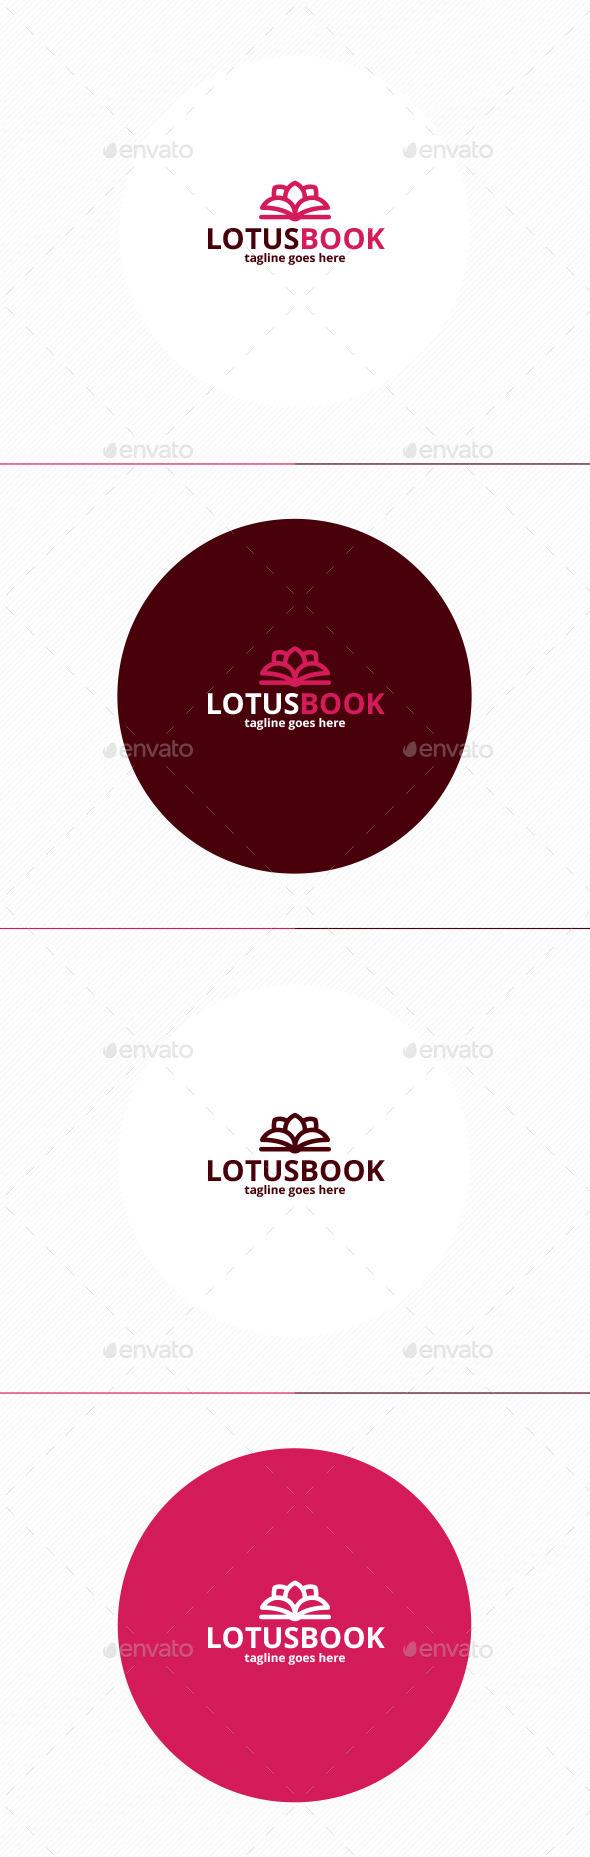 Lotus Book Logo - Nature Logo Templates